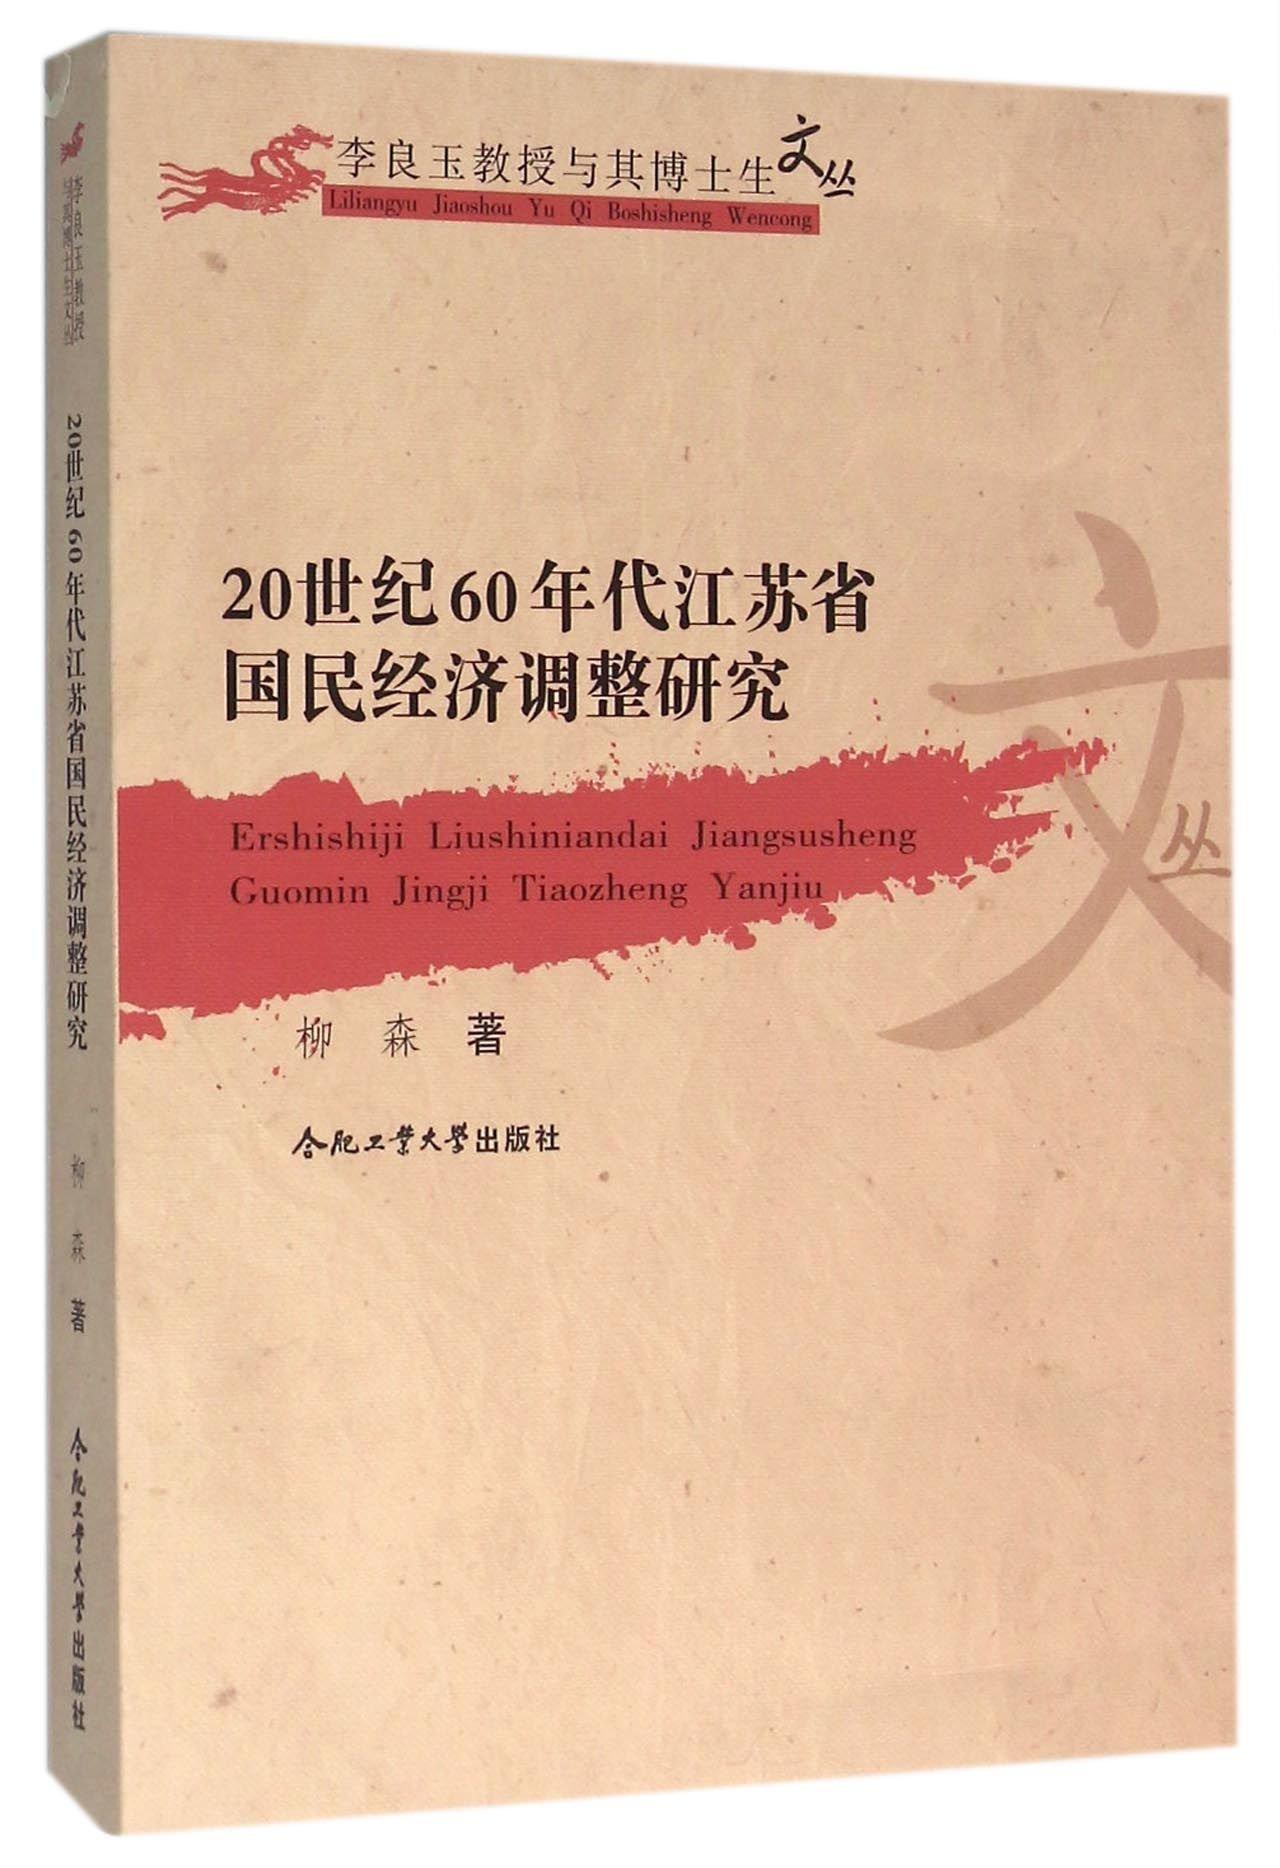 Download 20世纪60年代江苏省国民经济调整研究/李良玉教授与其博士生文丛 pdf epub